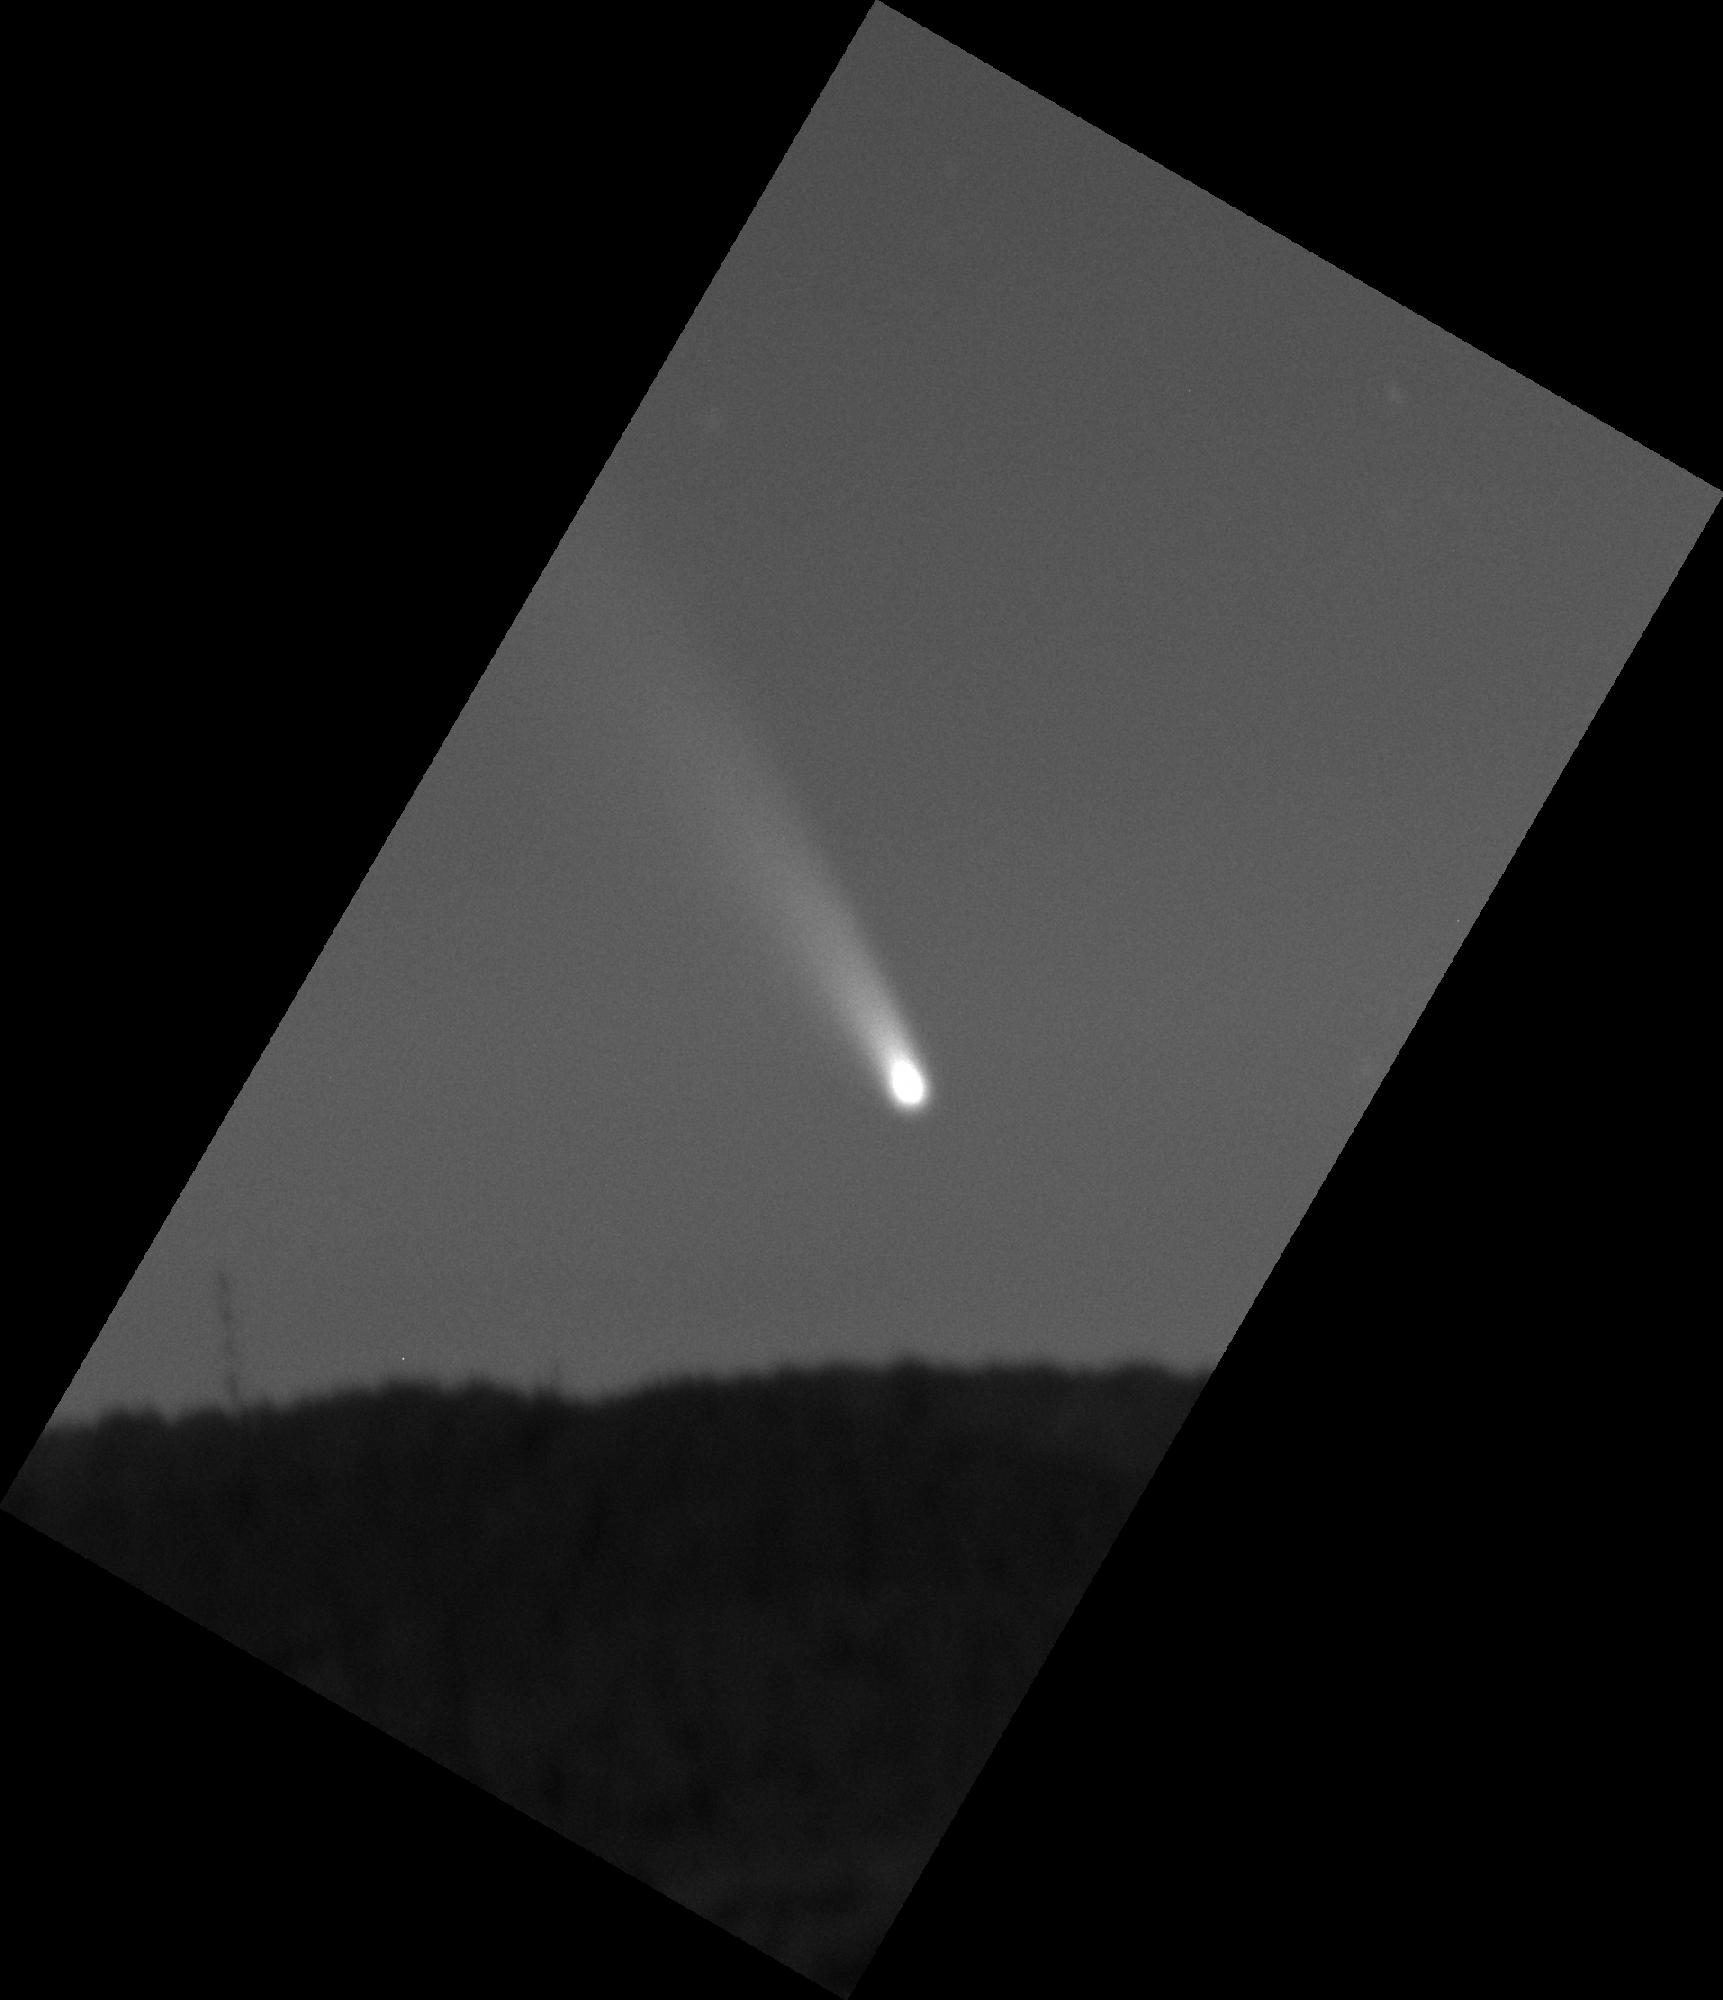 comete_c2020f3neowise_nb.thumb.png.8cbfc11c0eb34c5b6ce5140640b3c32f.png